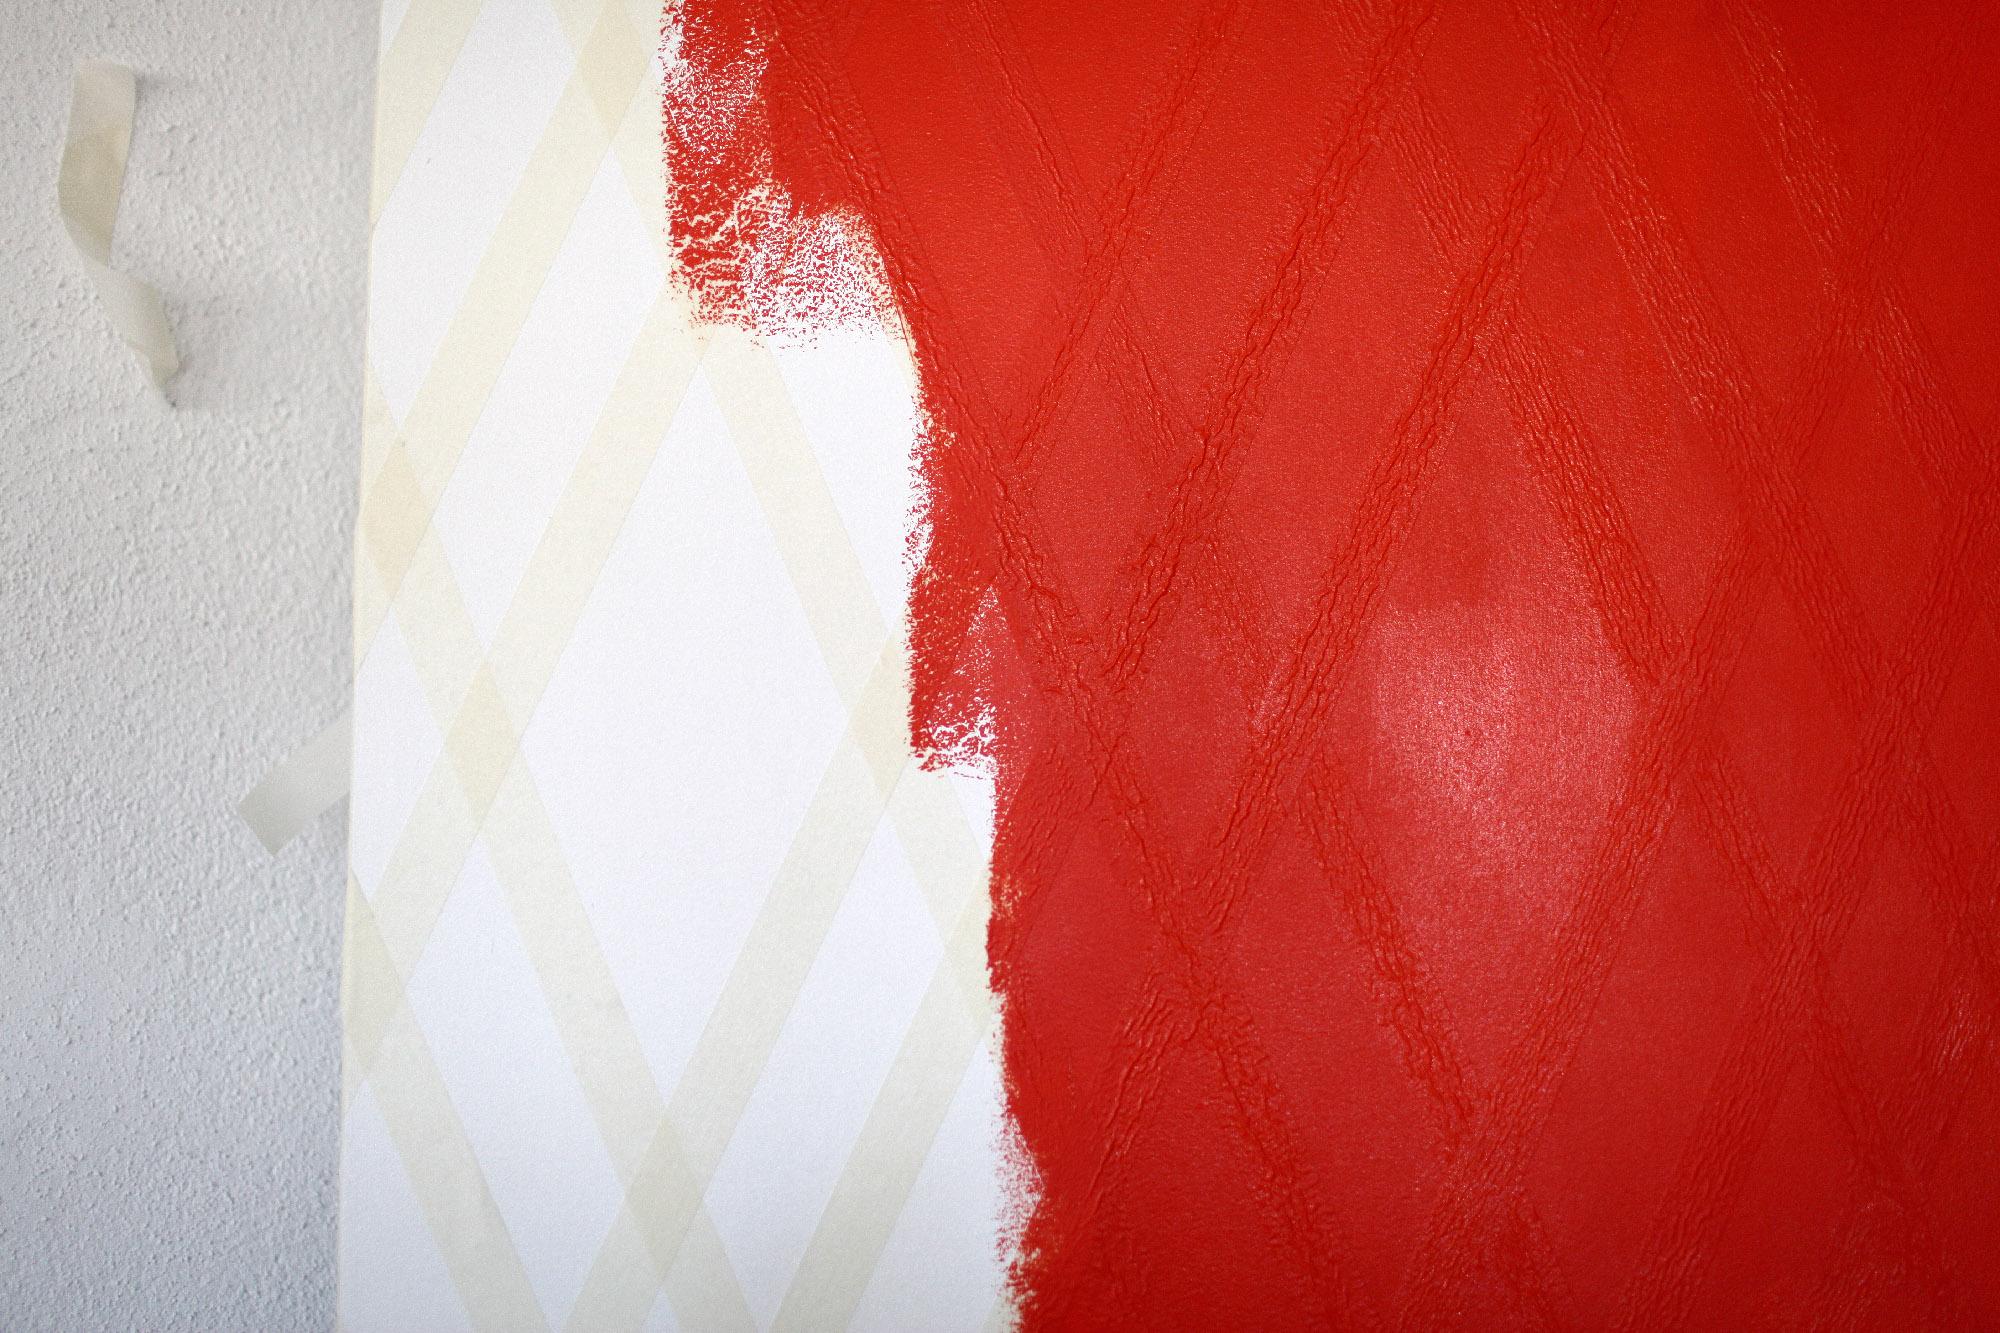 Anotherblogg_Anna_Lidström_DIY_Polka_Painted_Door4.JPG